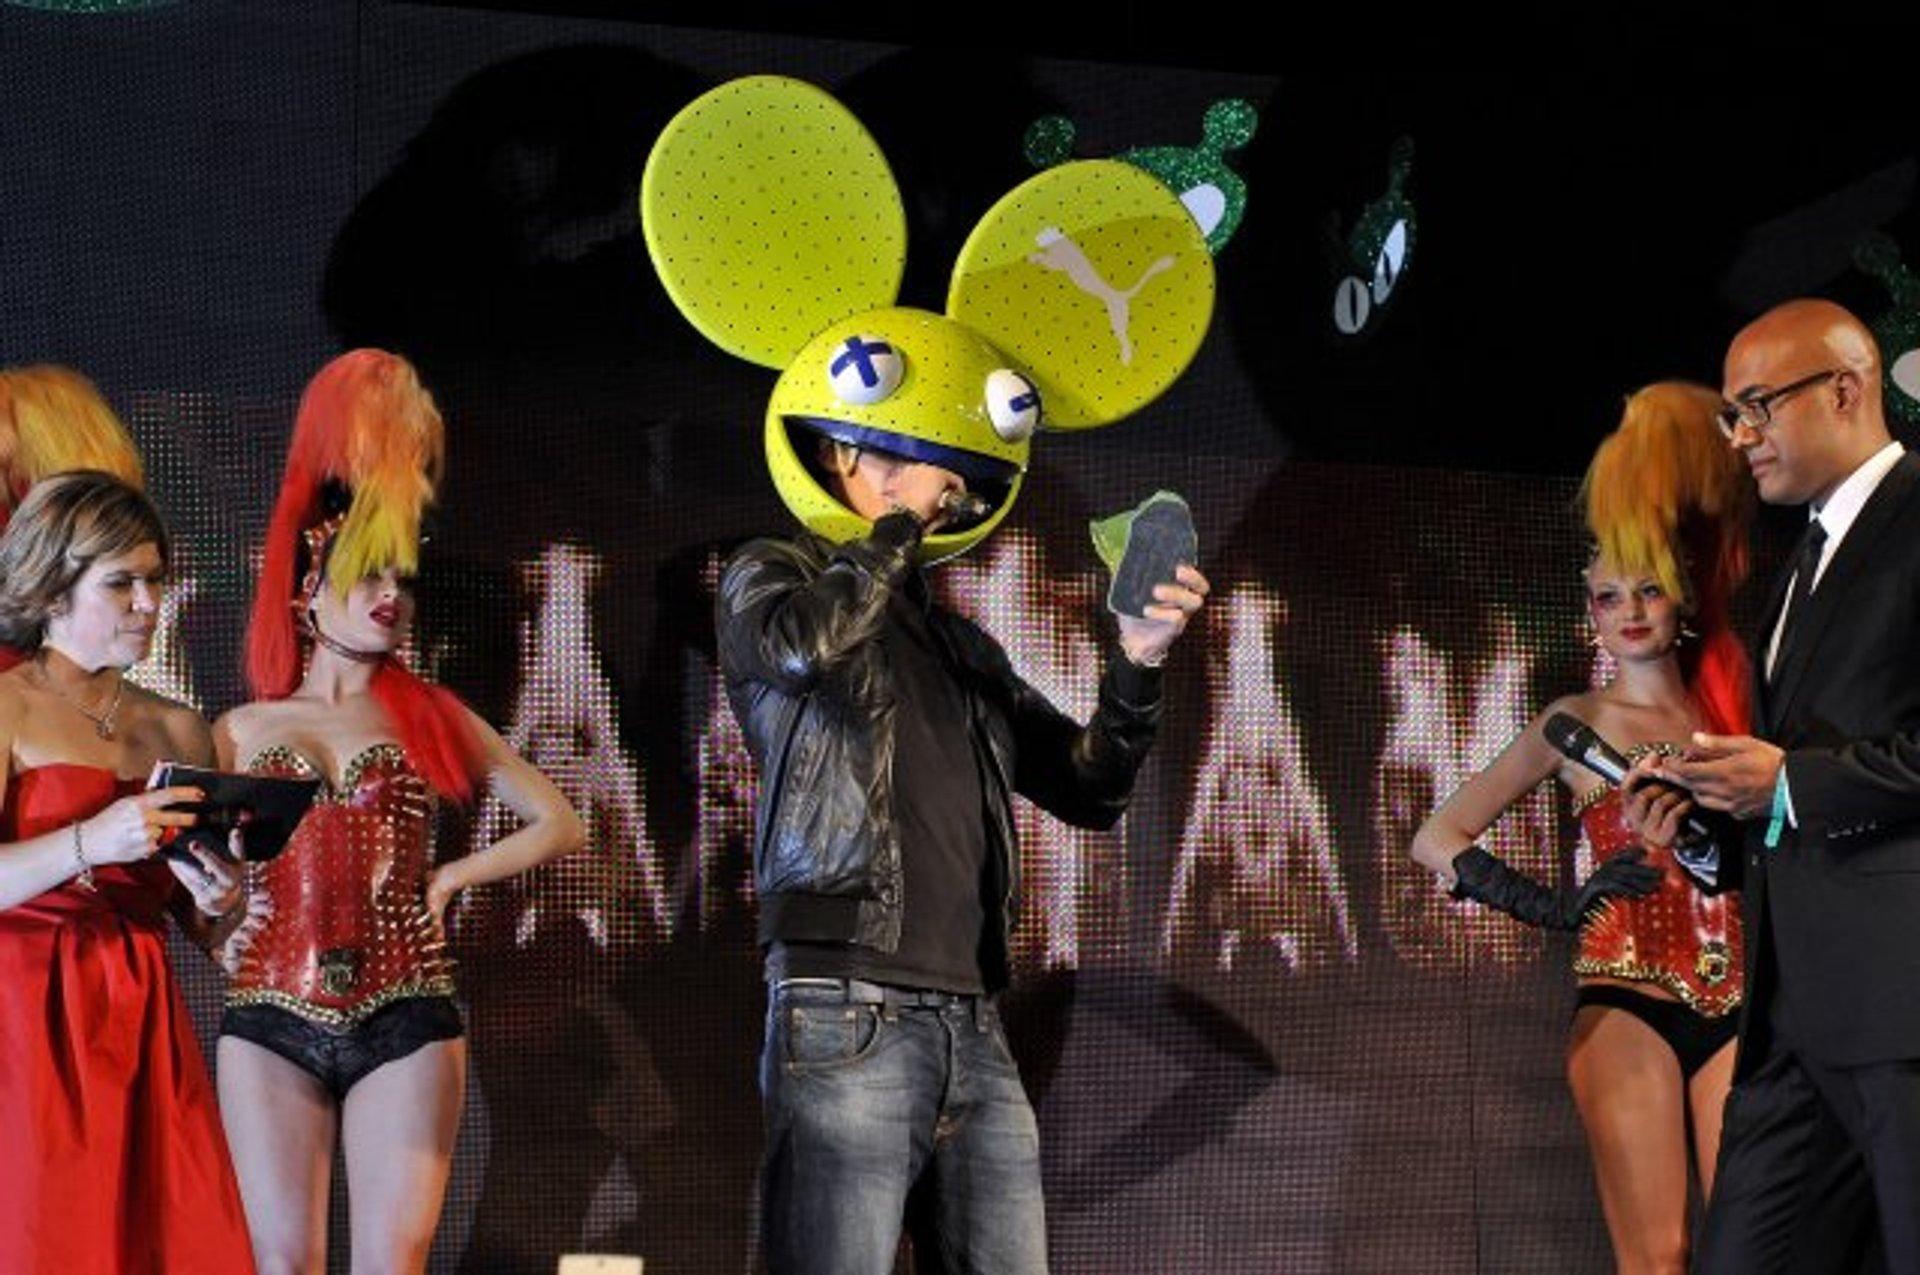 DJ Awards Ibiza in Ibiza 2020 - Best Time